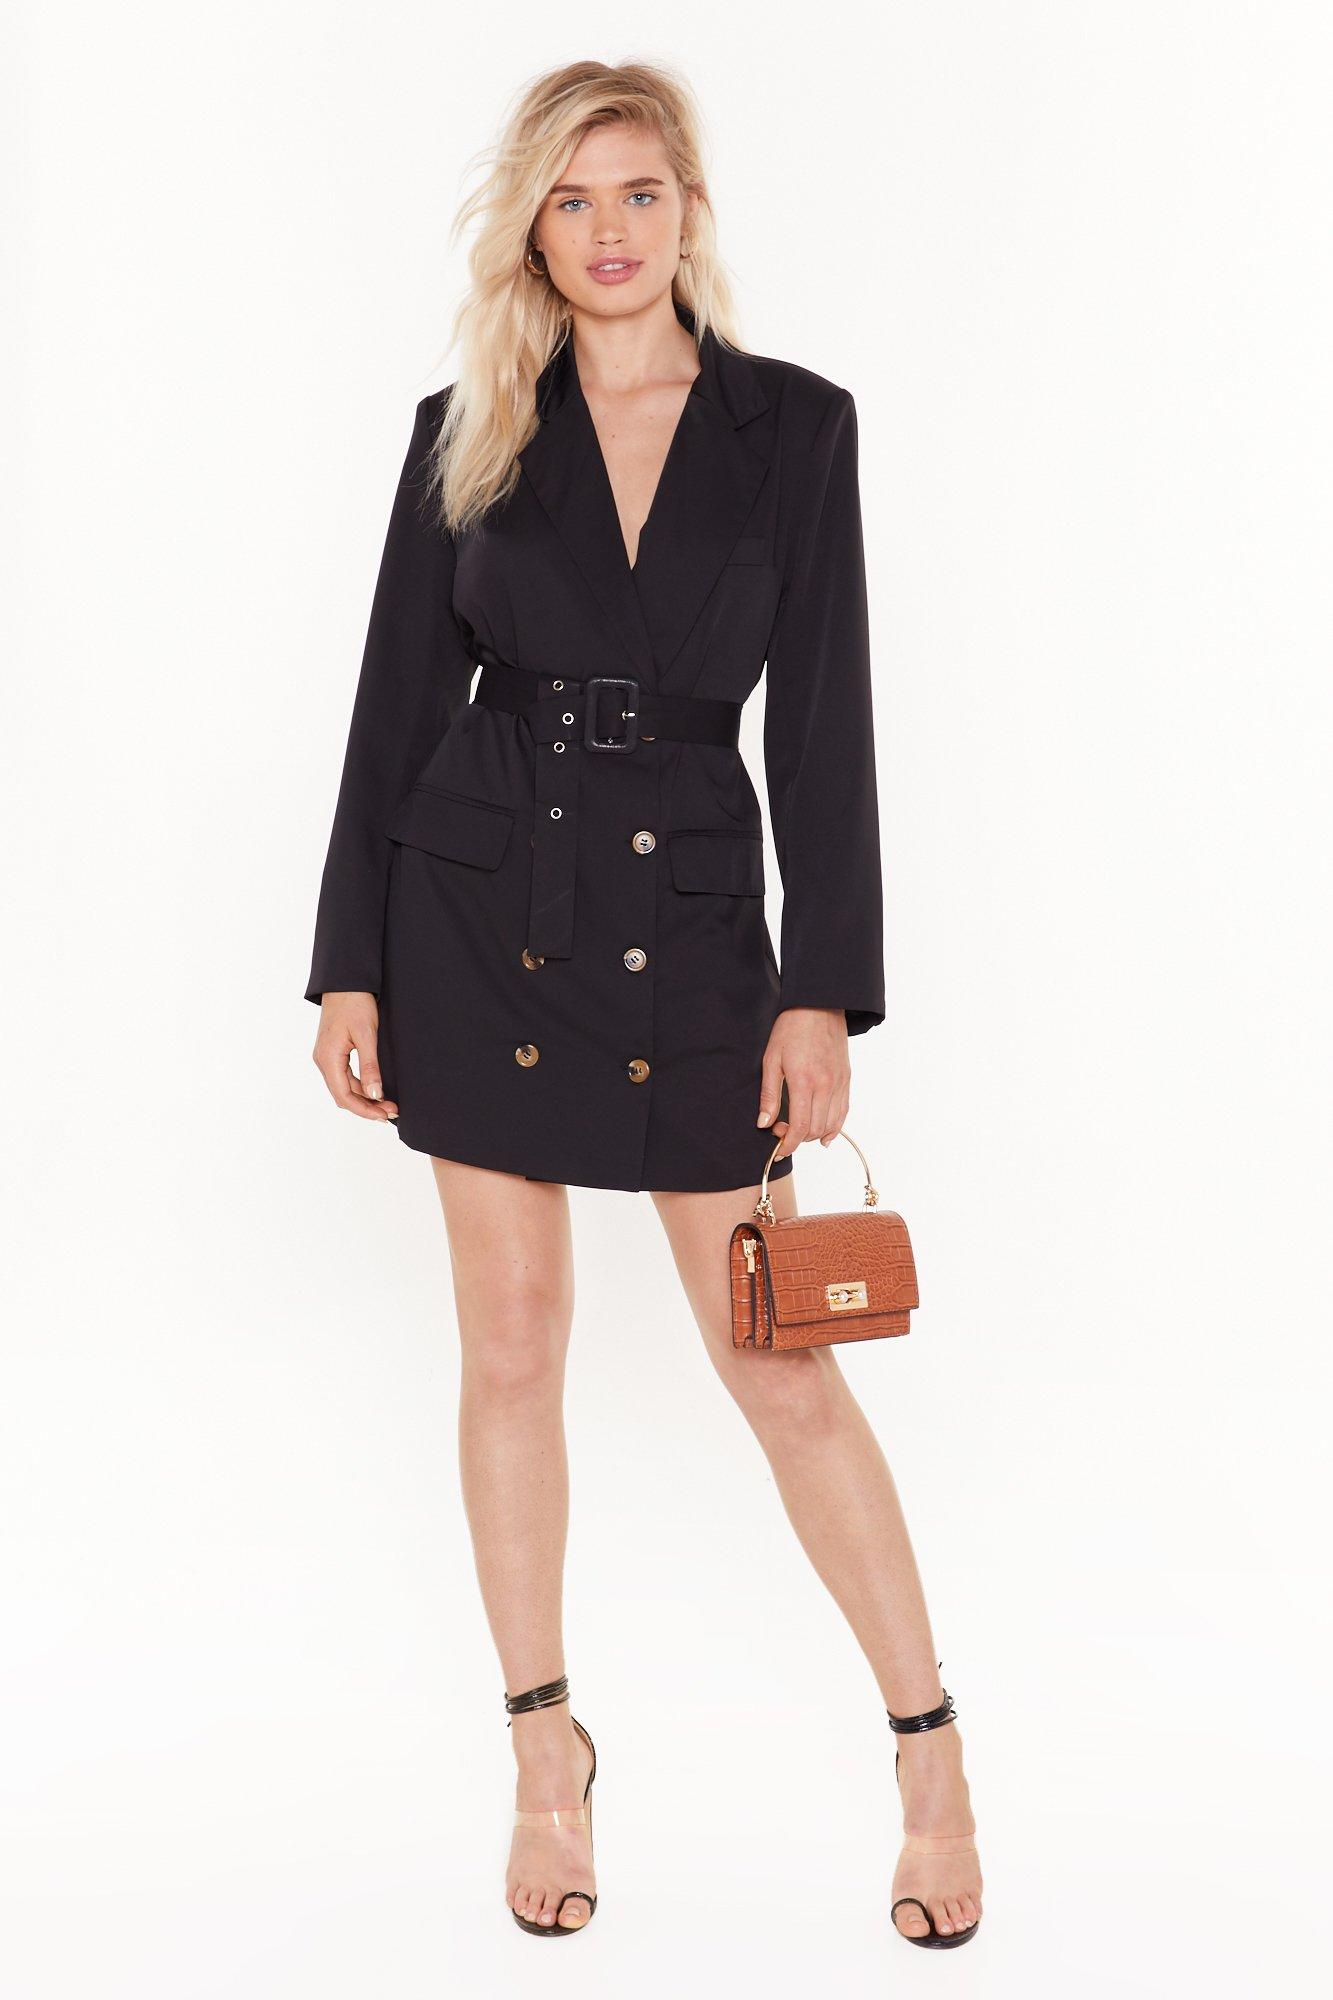 Image of We've Got the Power Oversized Blazer Dress